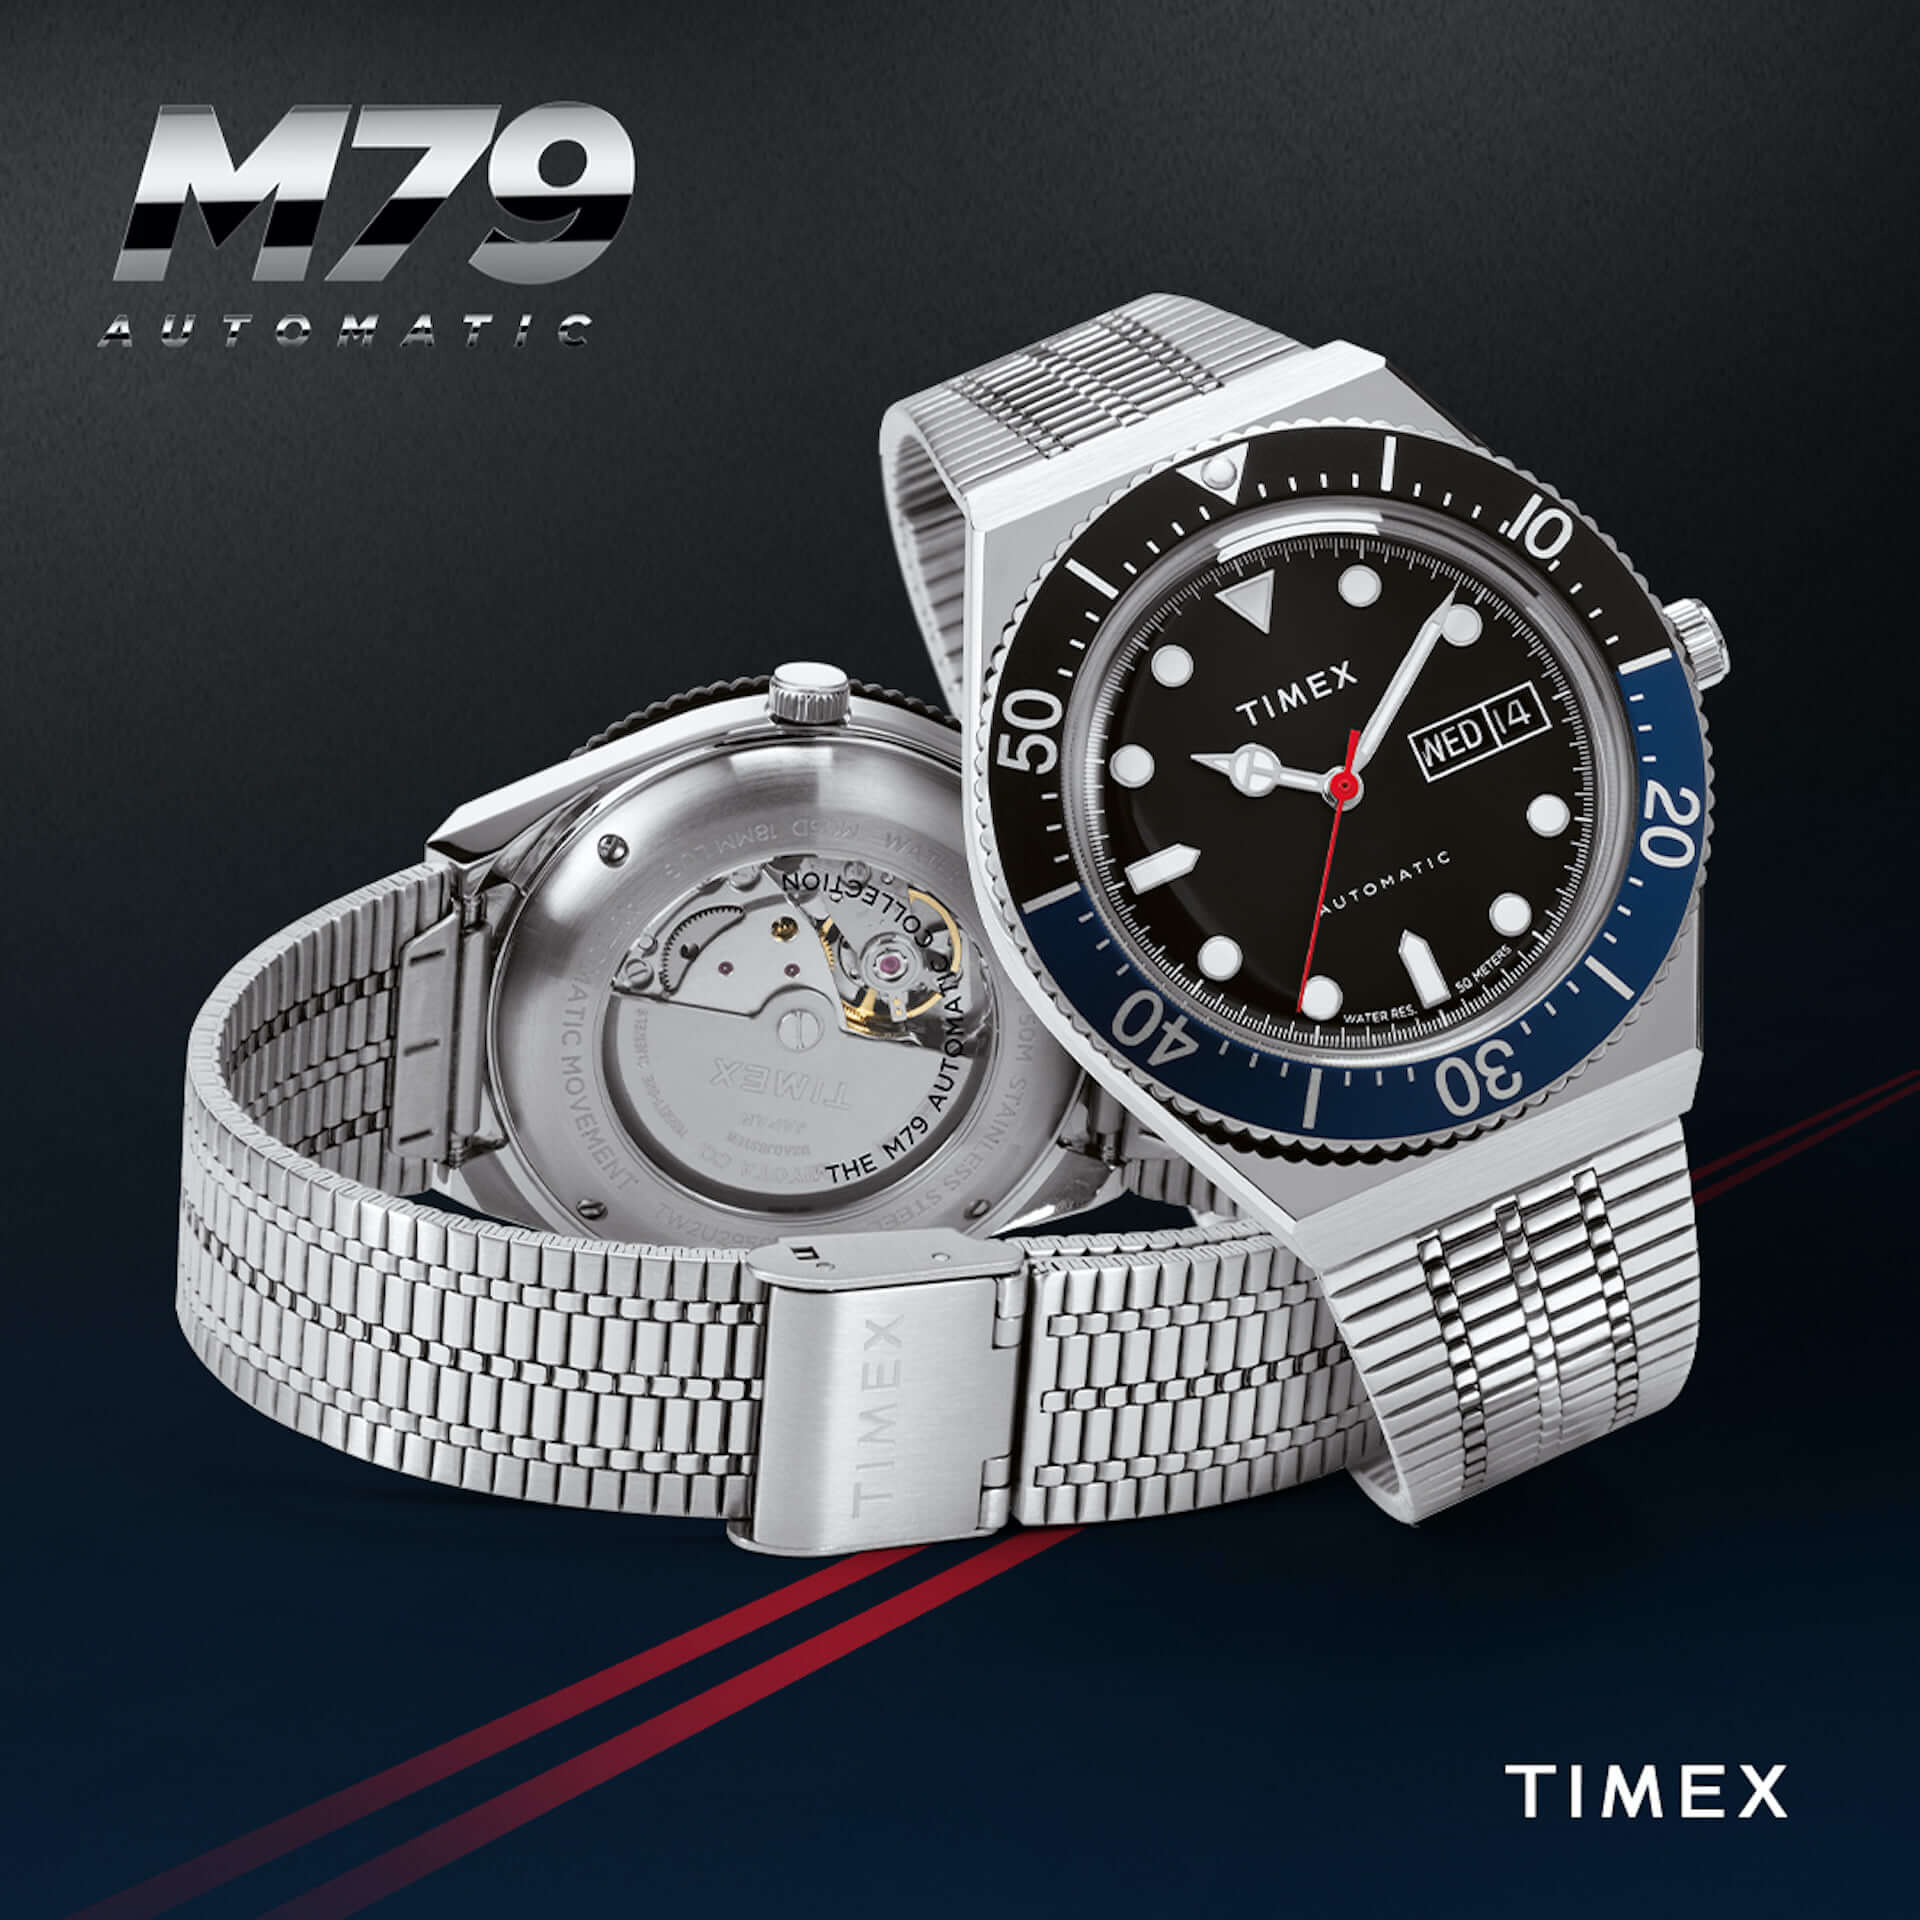 TIMEXの人気シリーズ『タイメックス キュー』に日本初上陸の派生モデル『M79』が登場!スケルトン仕様の裏蓋にも注目 tech201028_timex_3-1920x1920